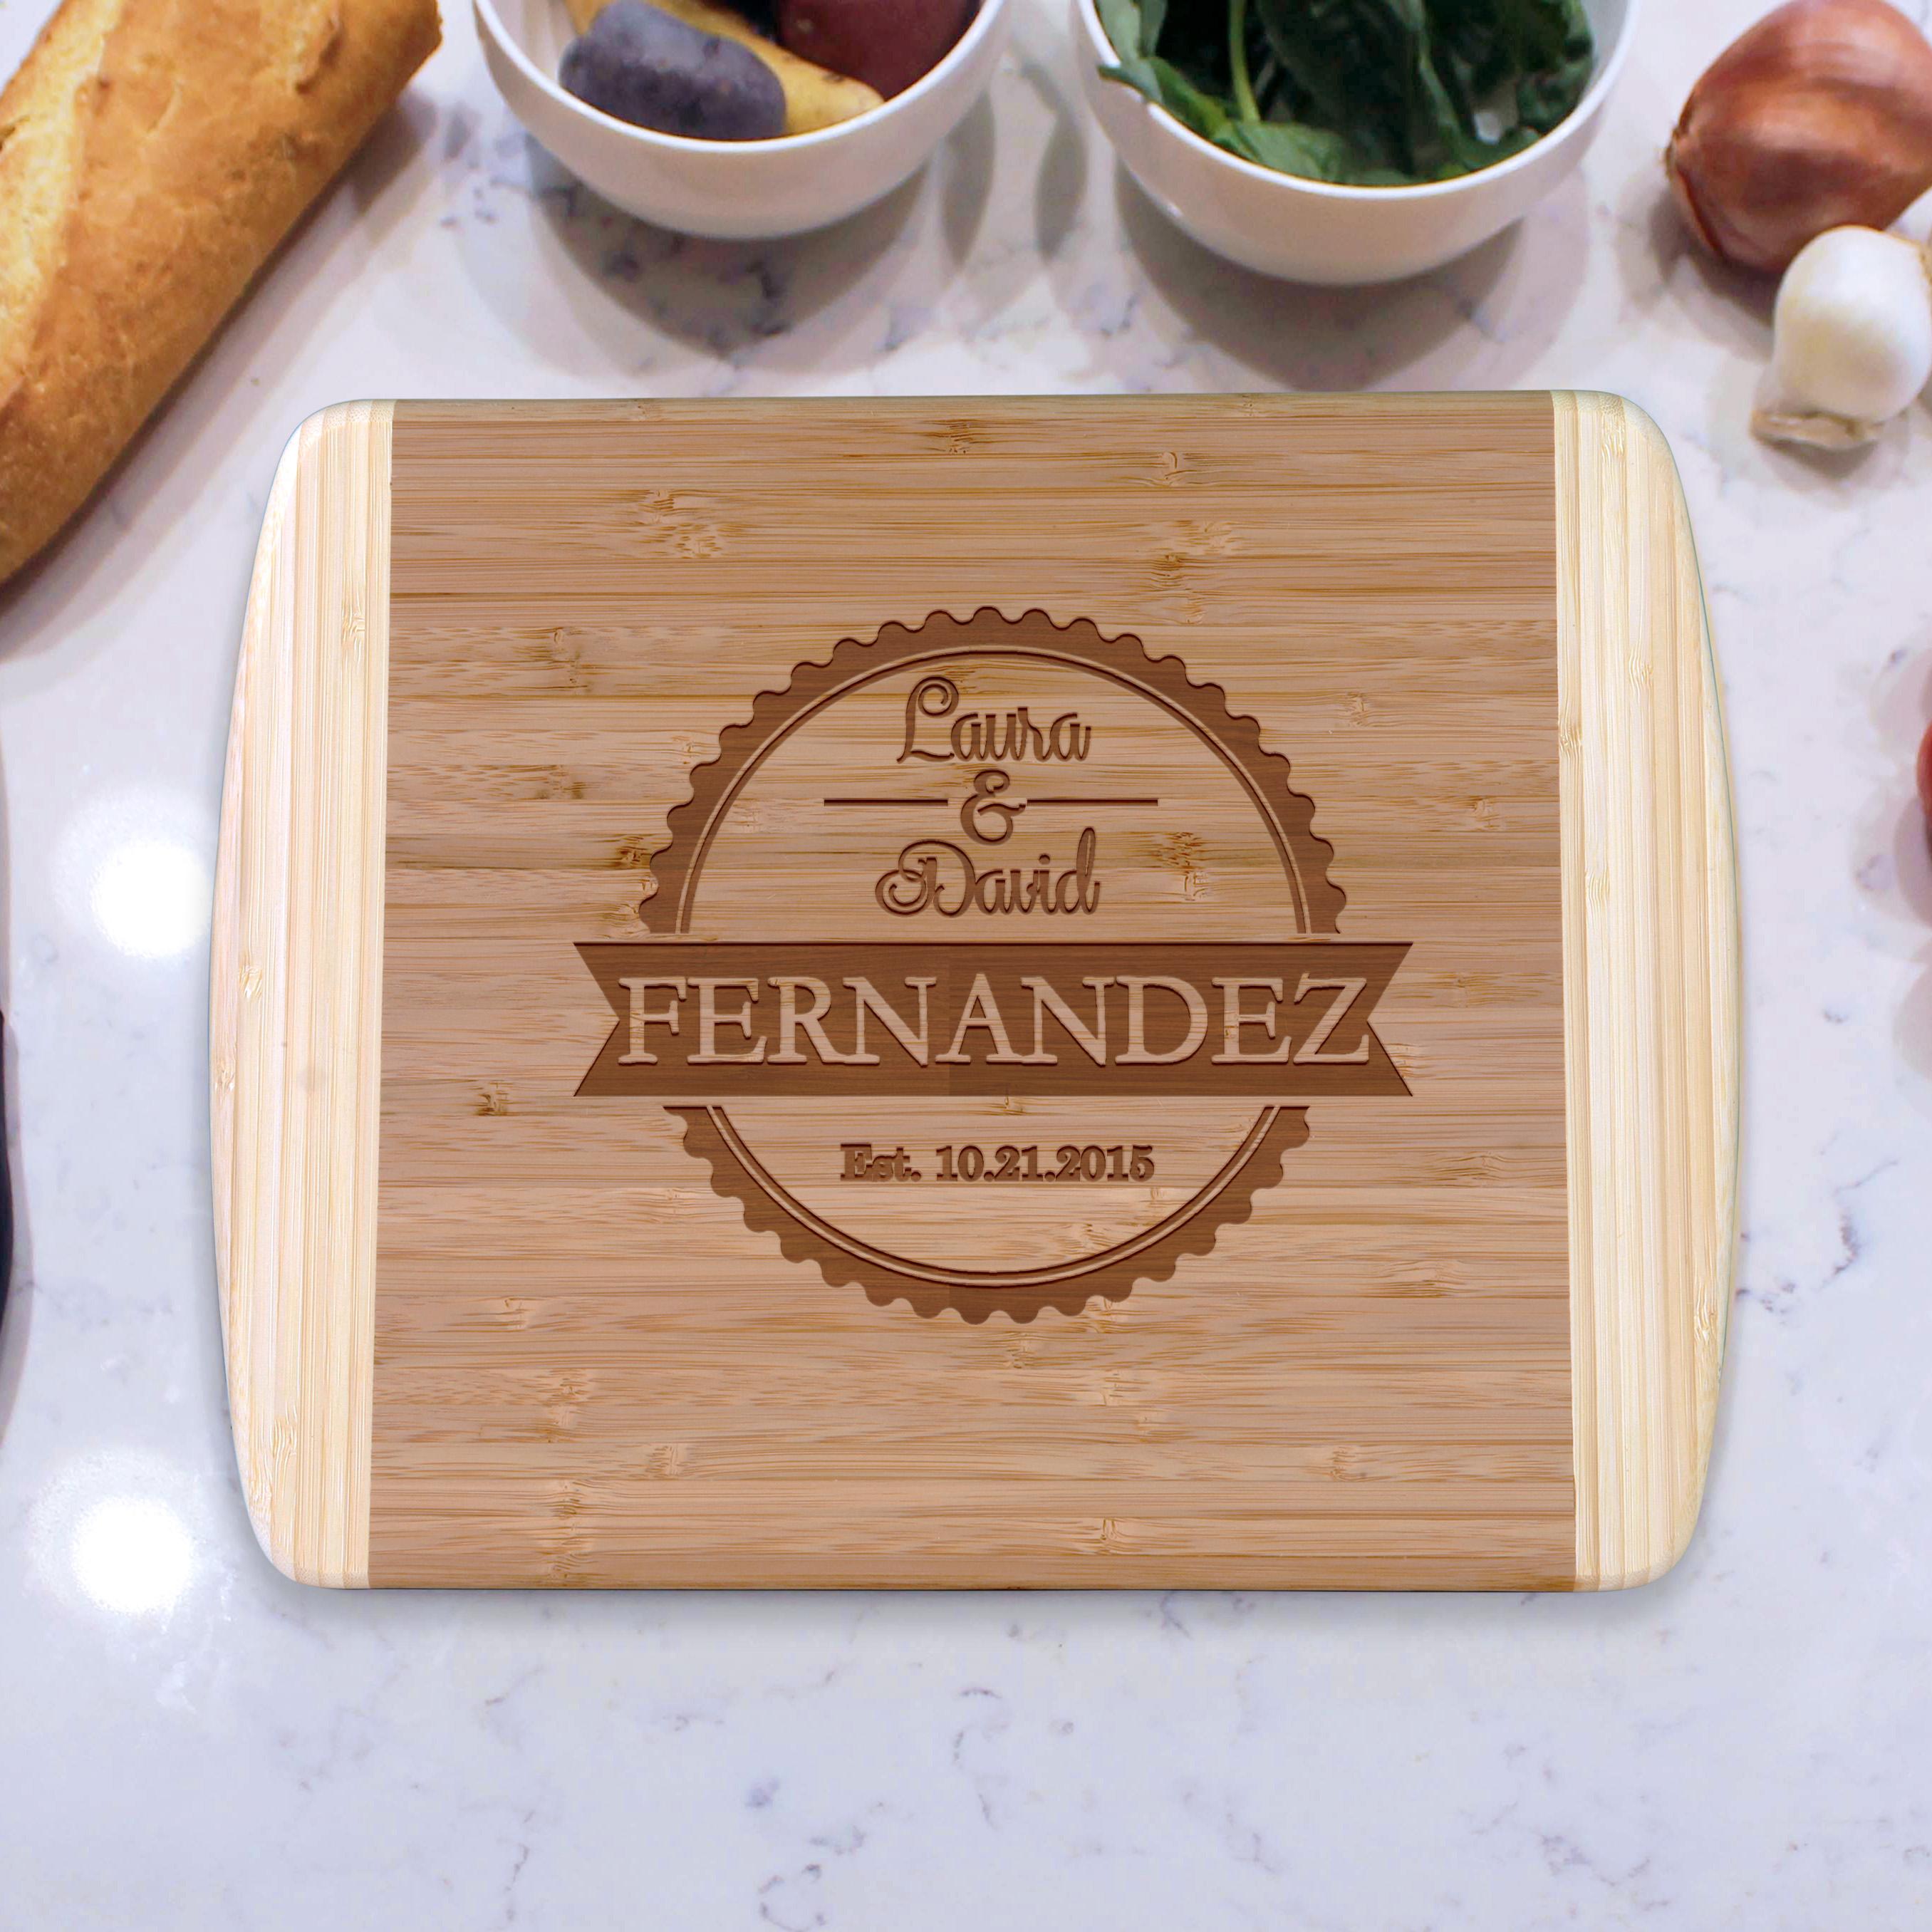 Fernandez Personalized Cutting Boards Etchey